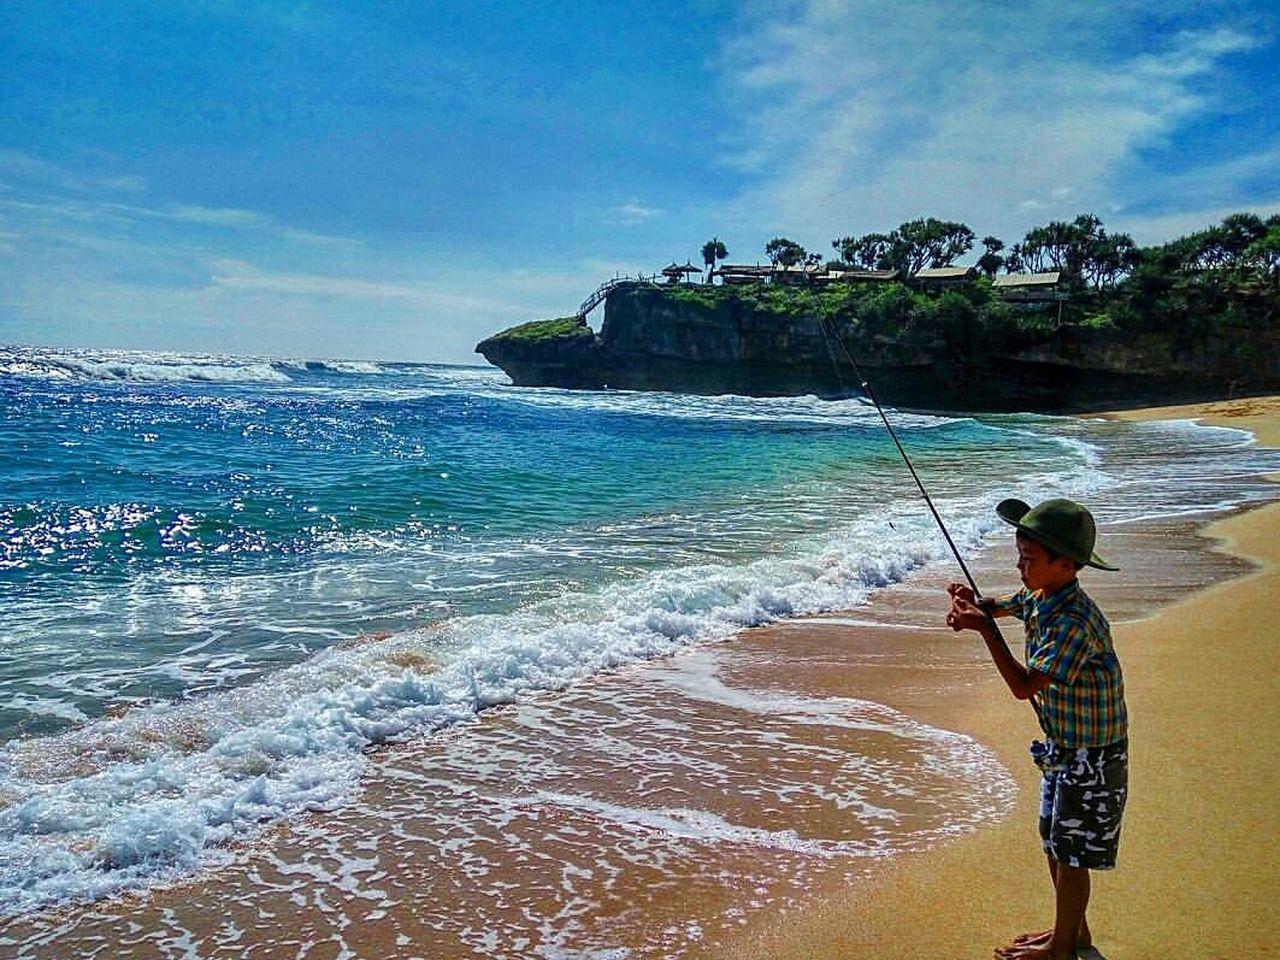 Blue Wave, Inframe: The Fishermen Boy